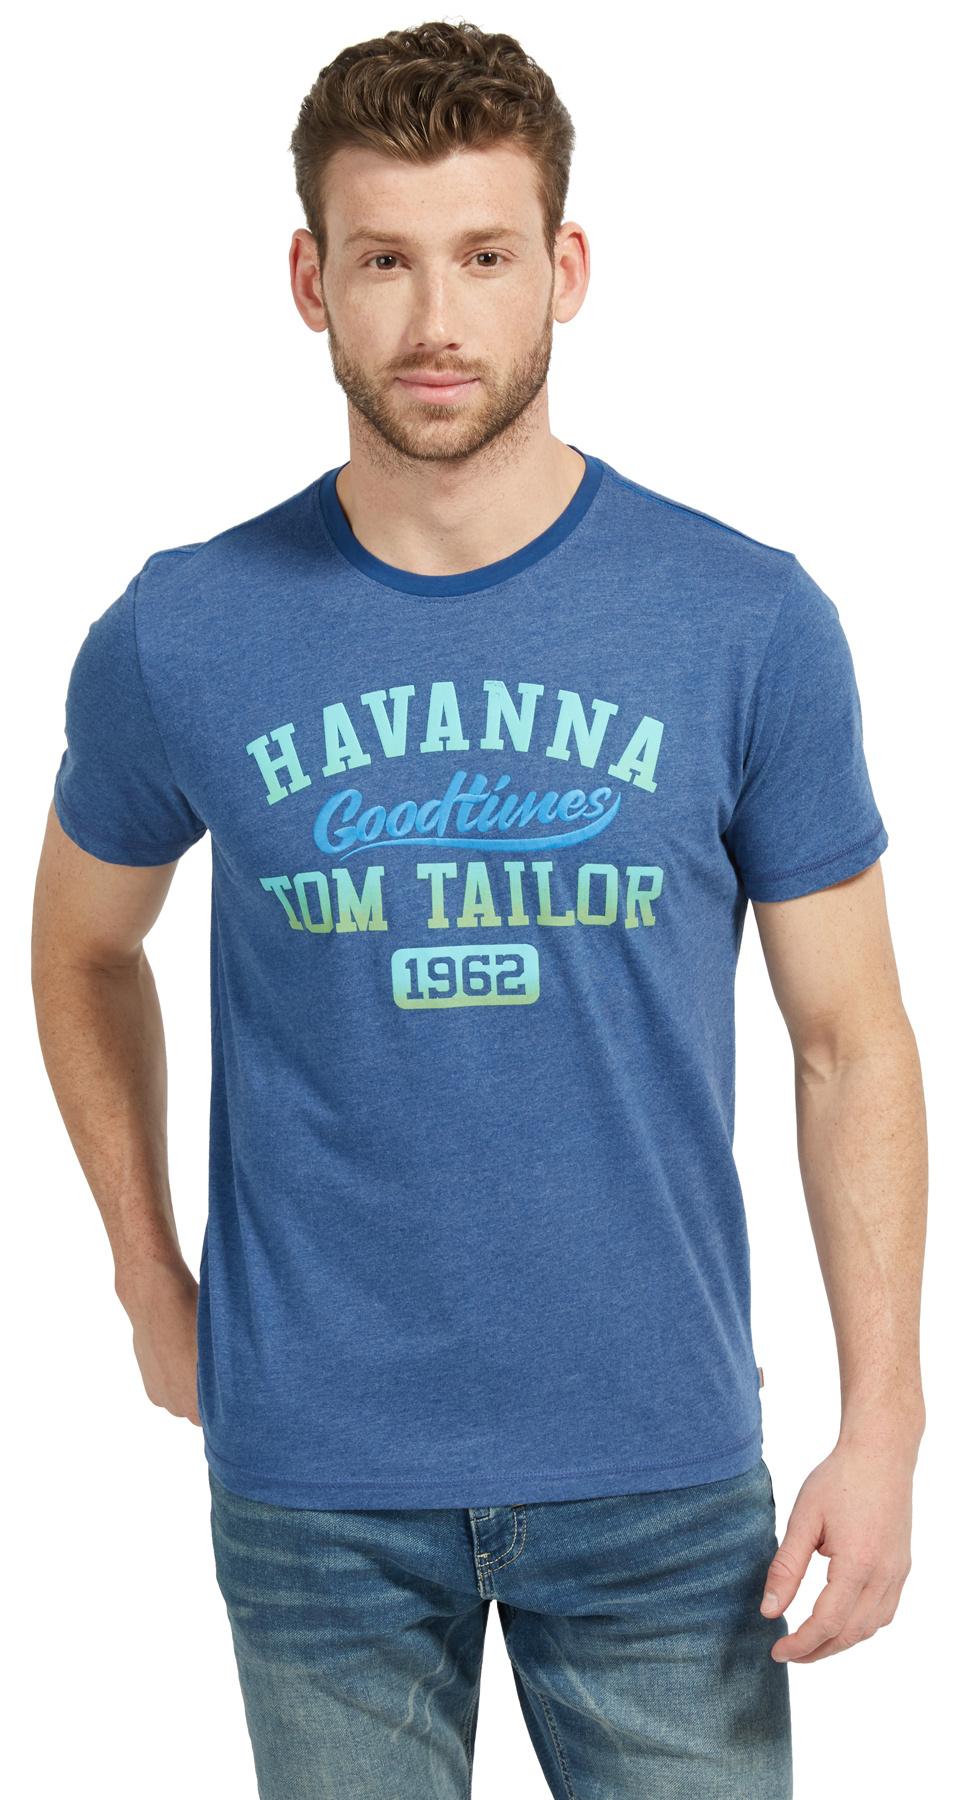 Tom Tailor pánské triko 10380216210/6621 Modrá XL